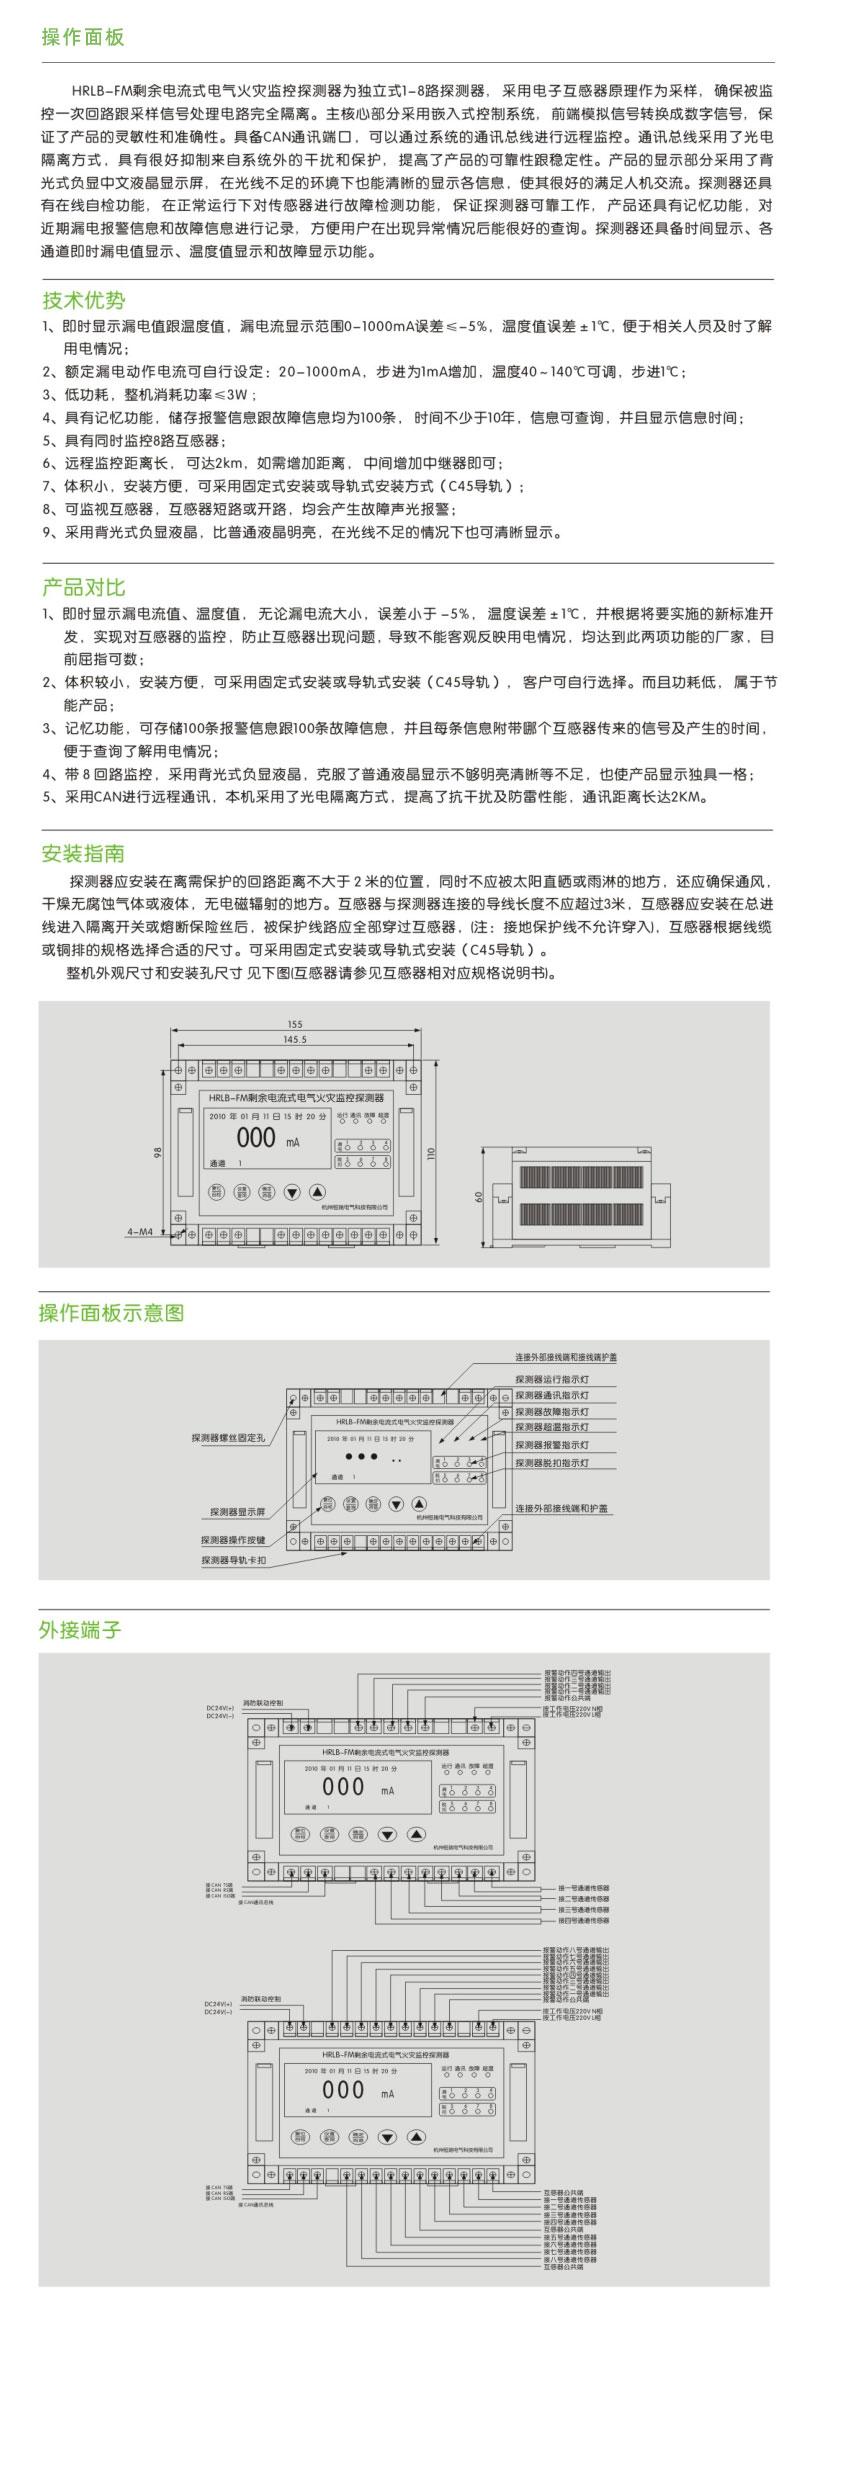 02_2_detail_HRLB-FM(1-8路明装液晶型).jpg